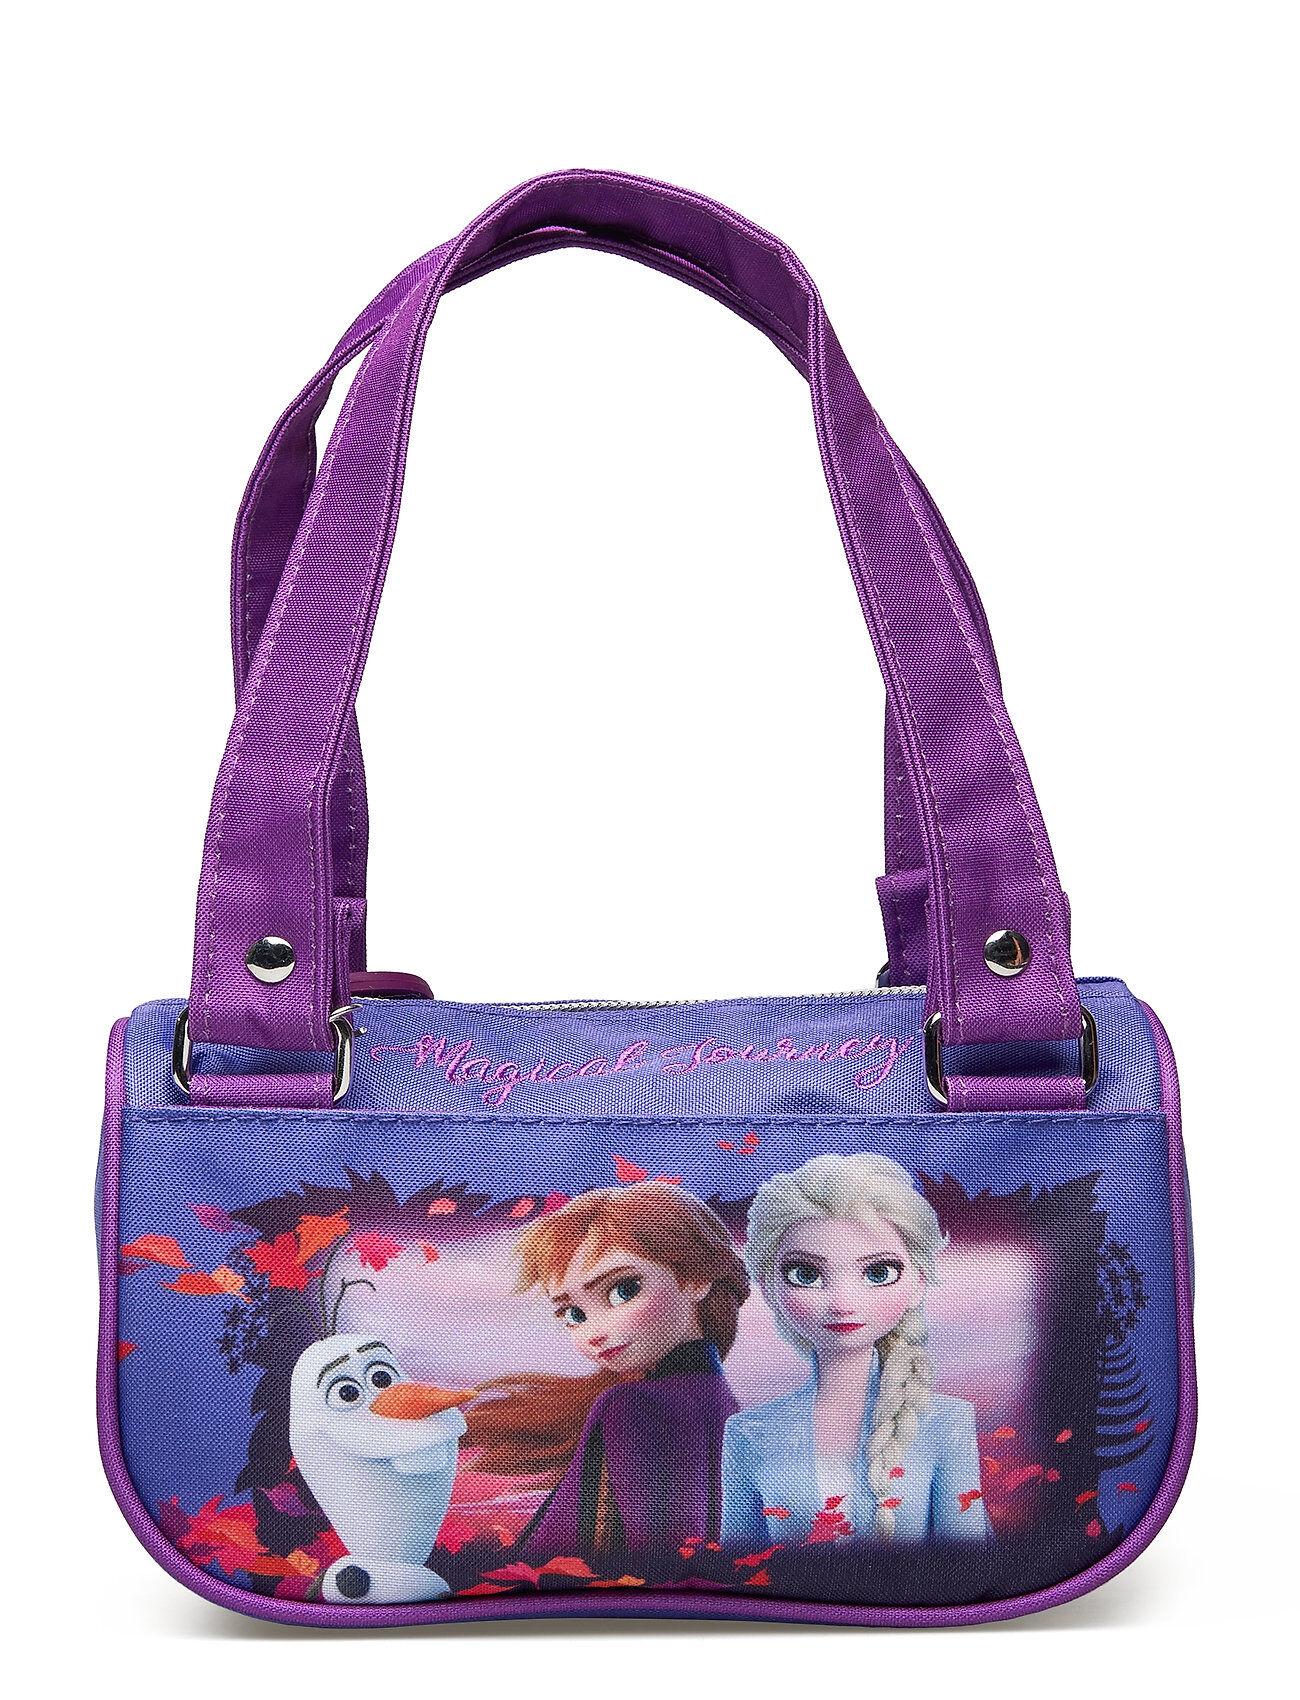 Disney Frozen 2 Small Handbag Tote Laukku Liila Disney Frozen